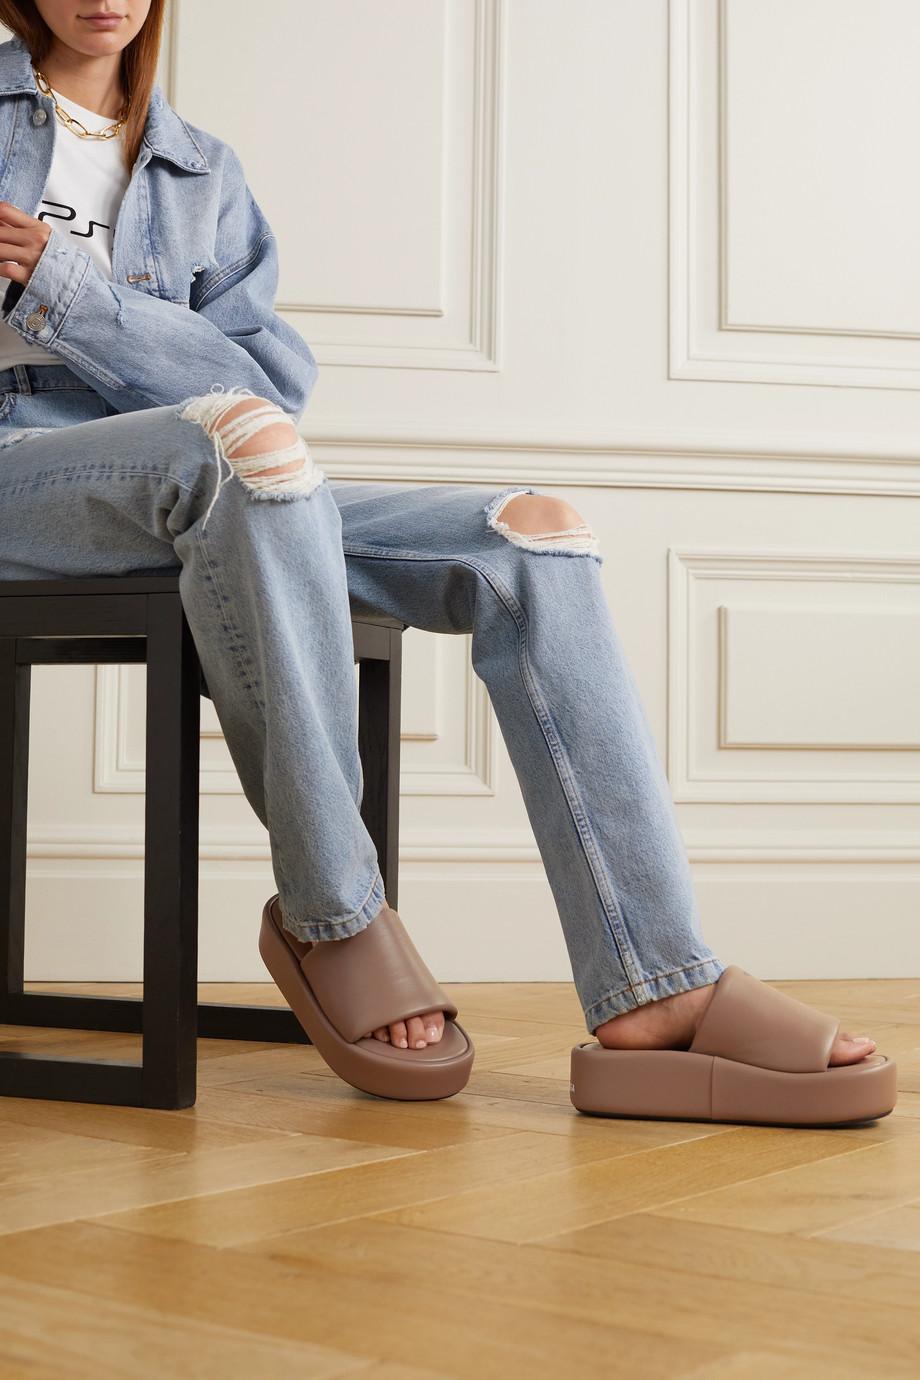 Balenciaga Rise leather platform sandals